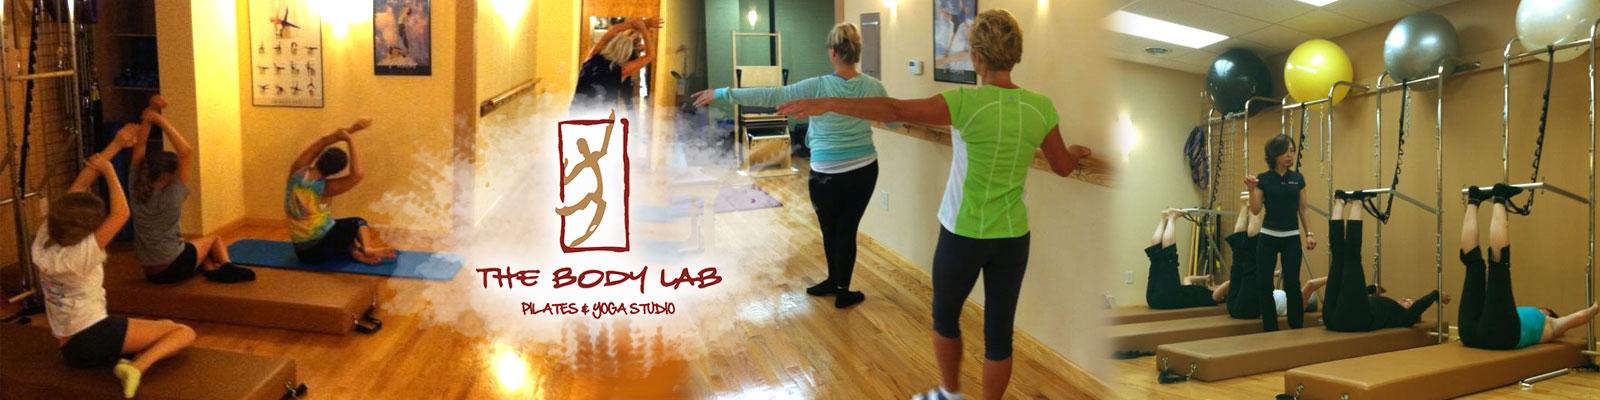 The Body Lab PIlates Studio